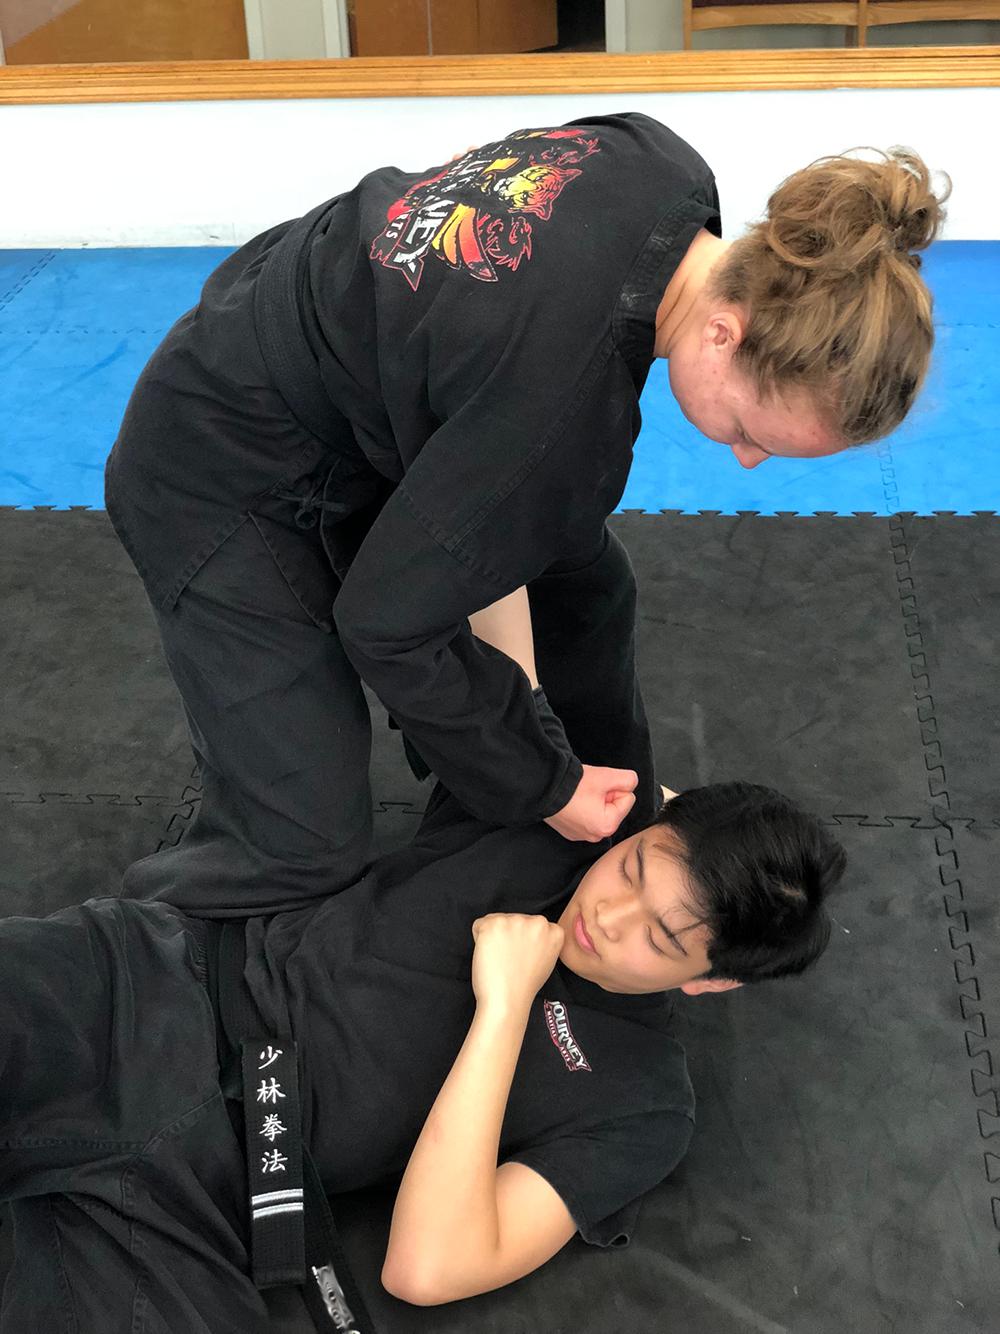 Journey Martial Arts Teen thrust punching a teen opponent